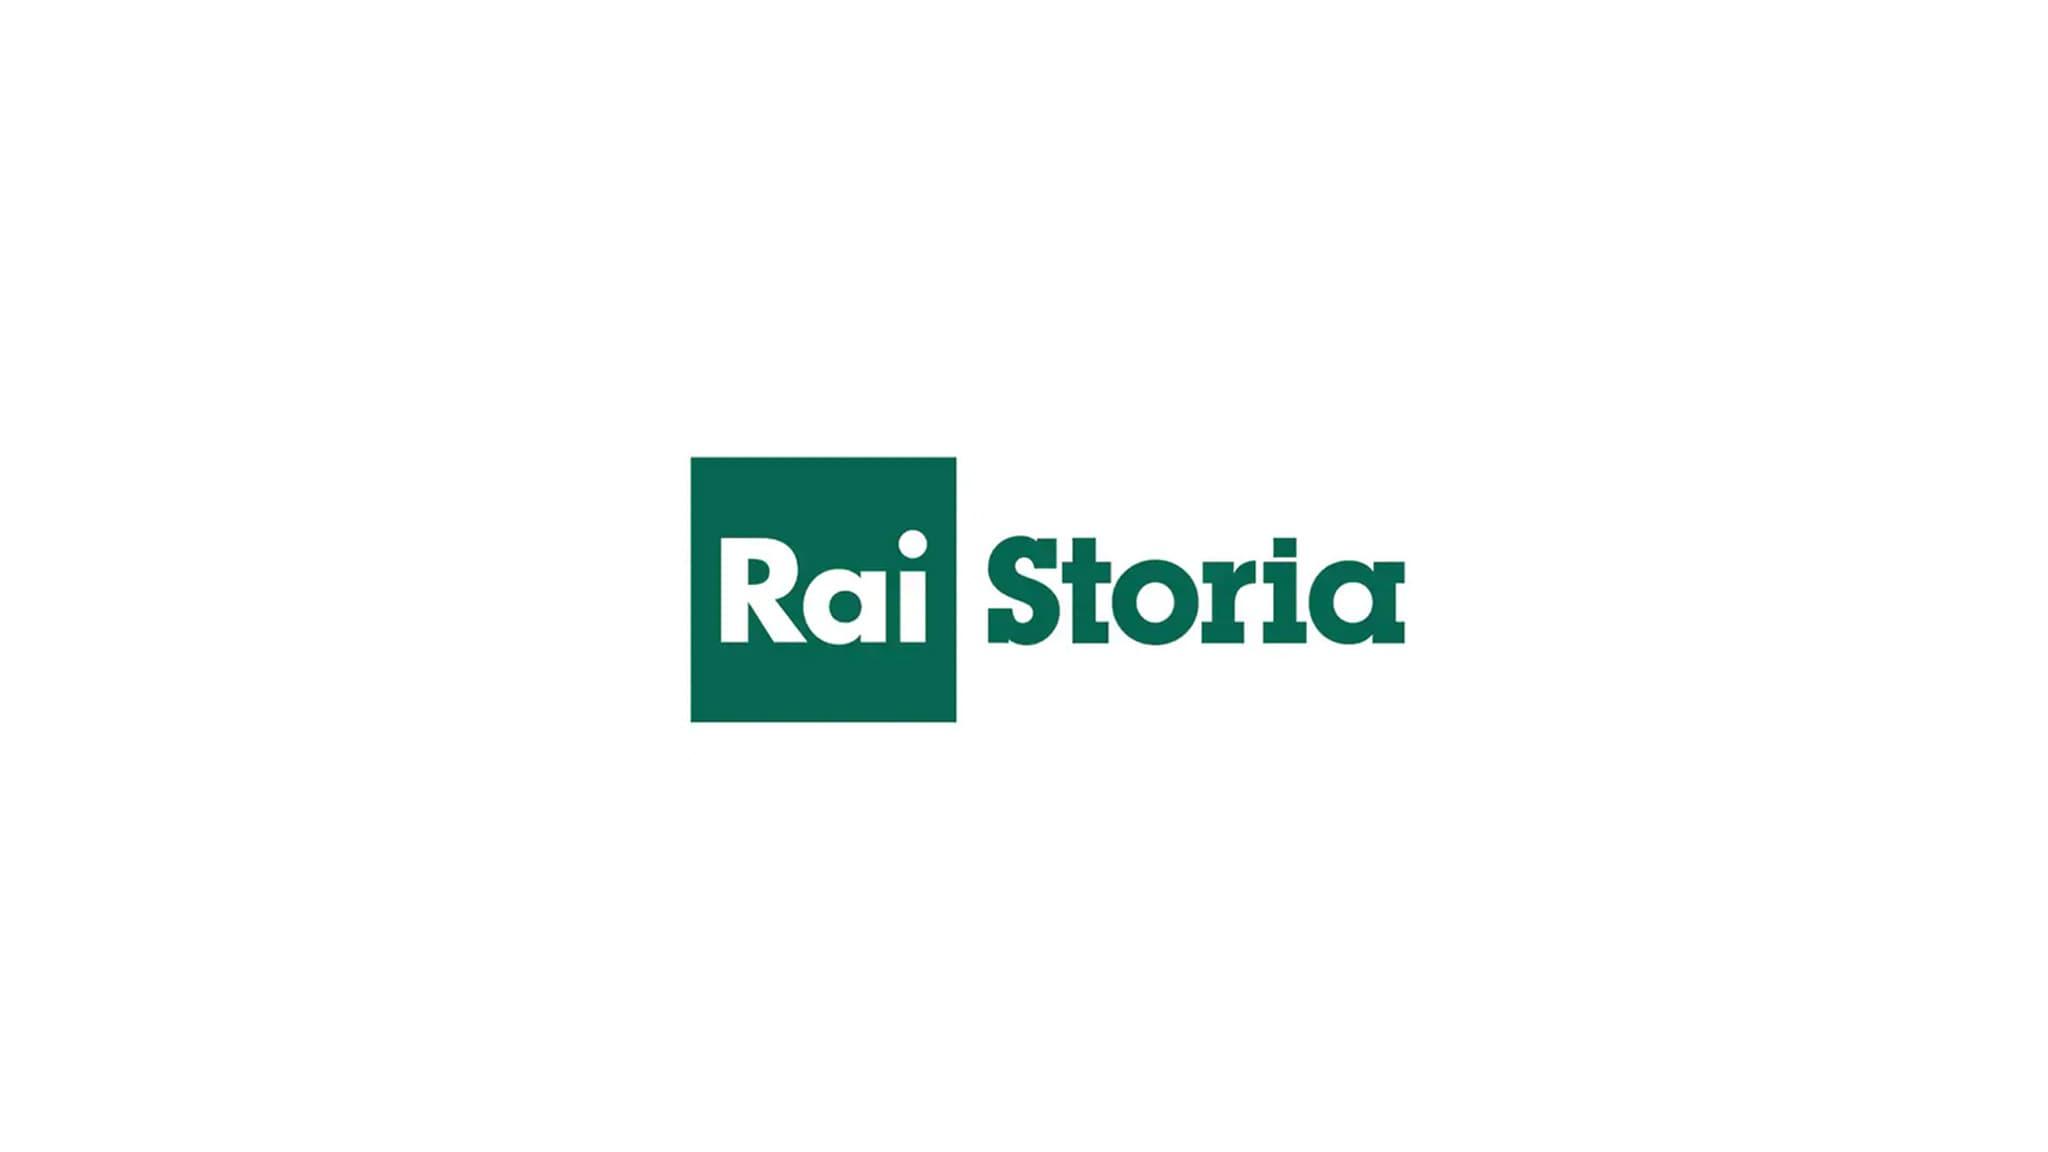 Rai Storia Domenica con Francesco Montanari p.9